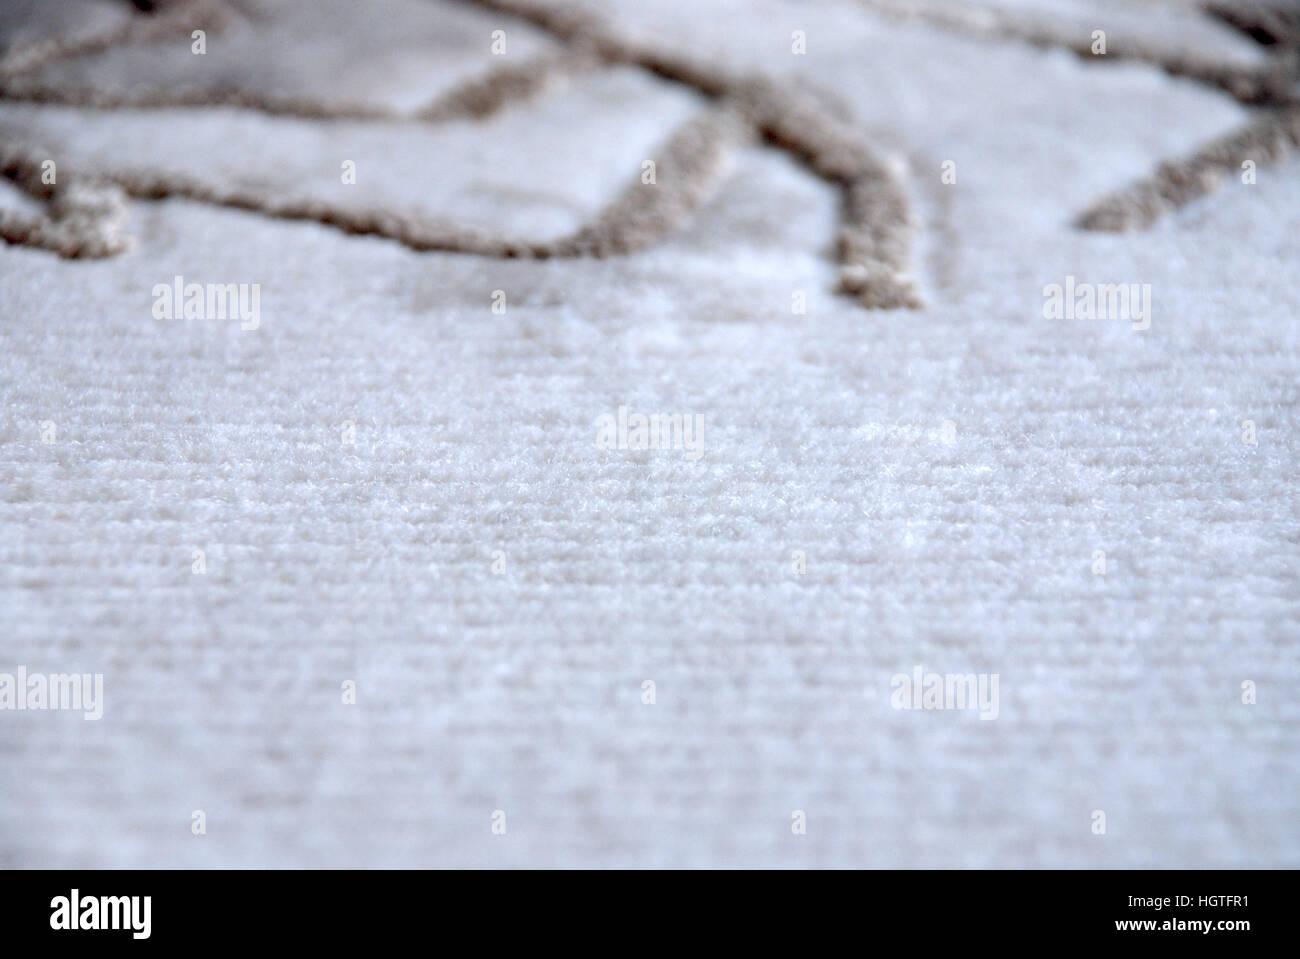 Textura gris alfombra decoración fondos Imagen De Stock